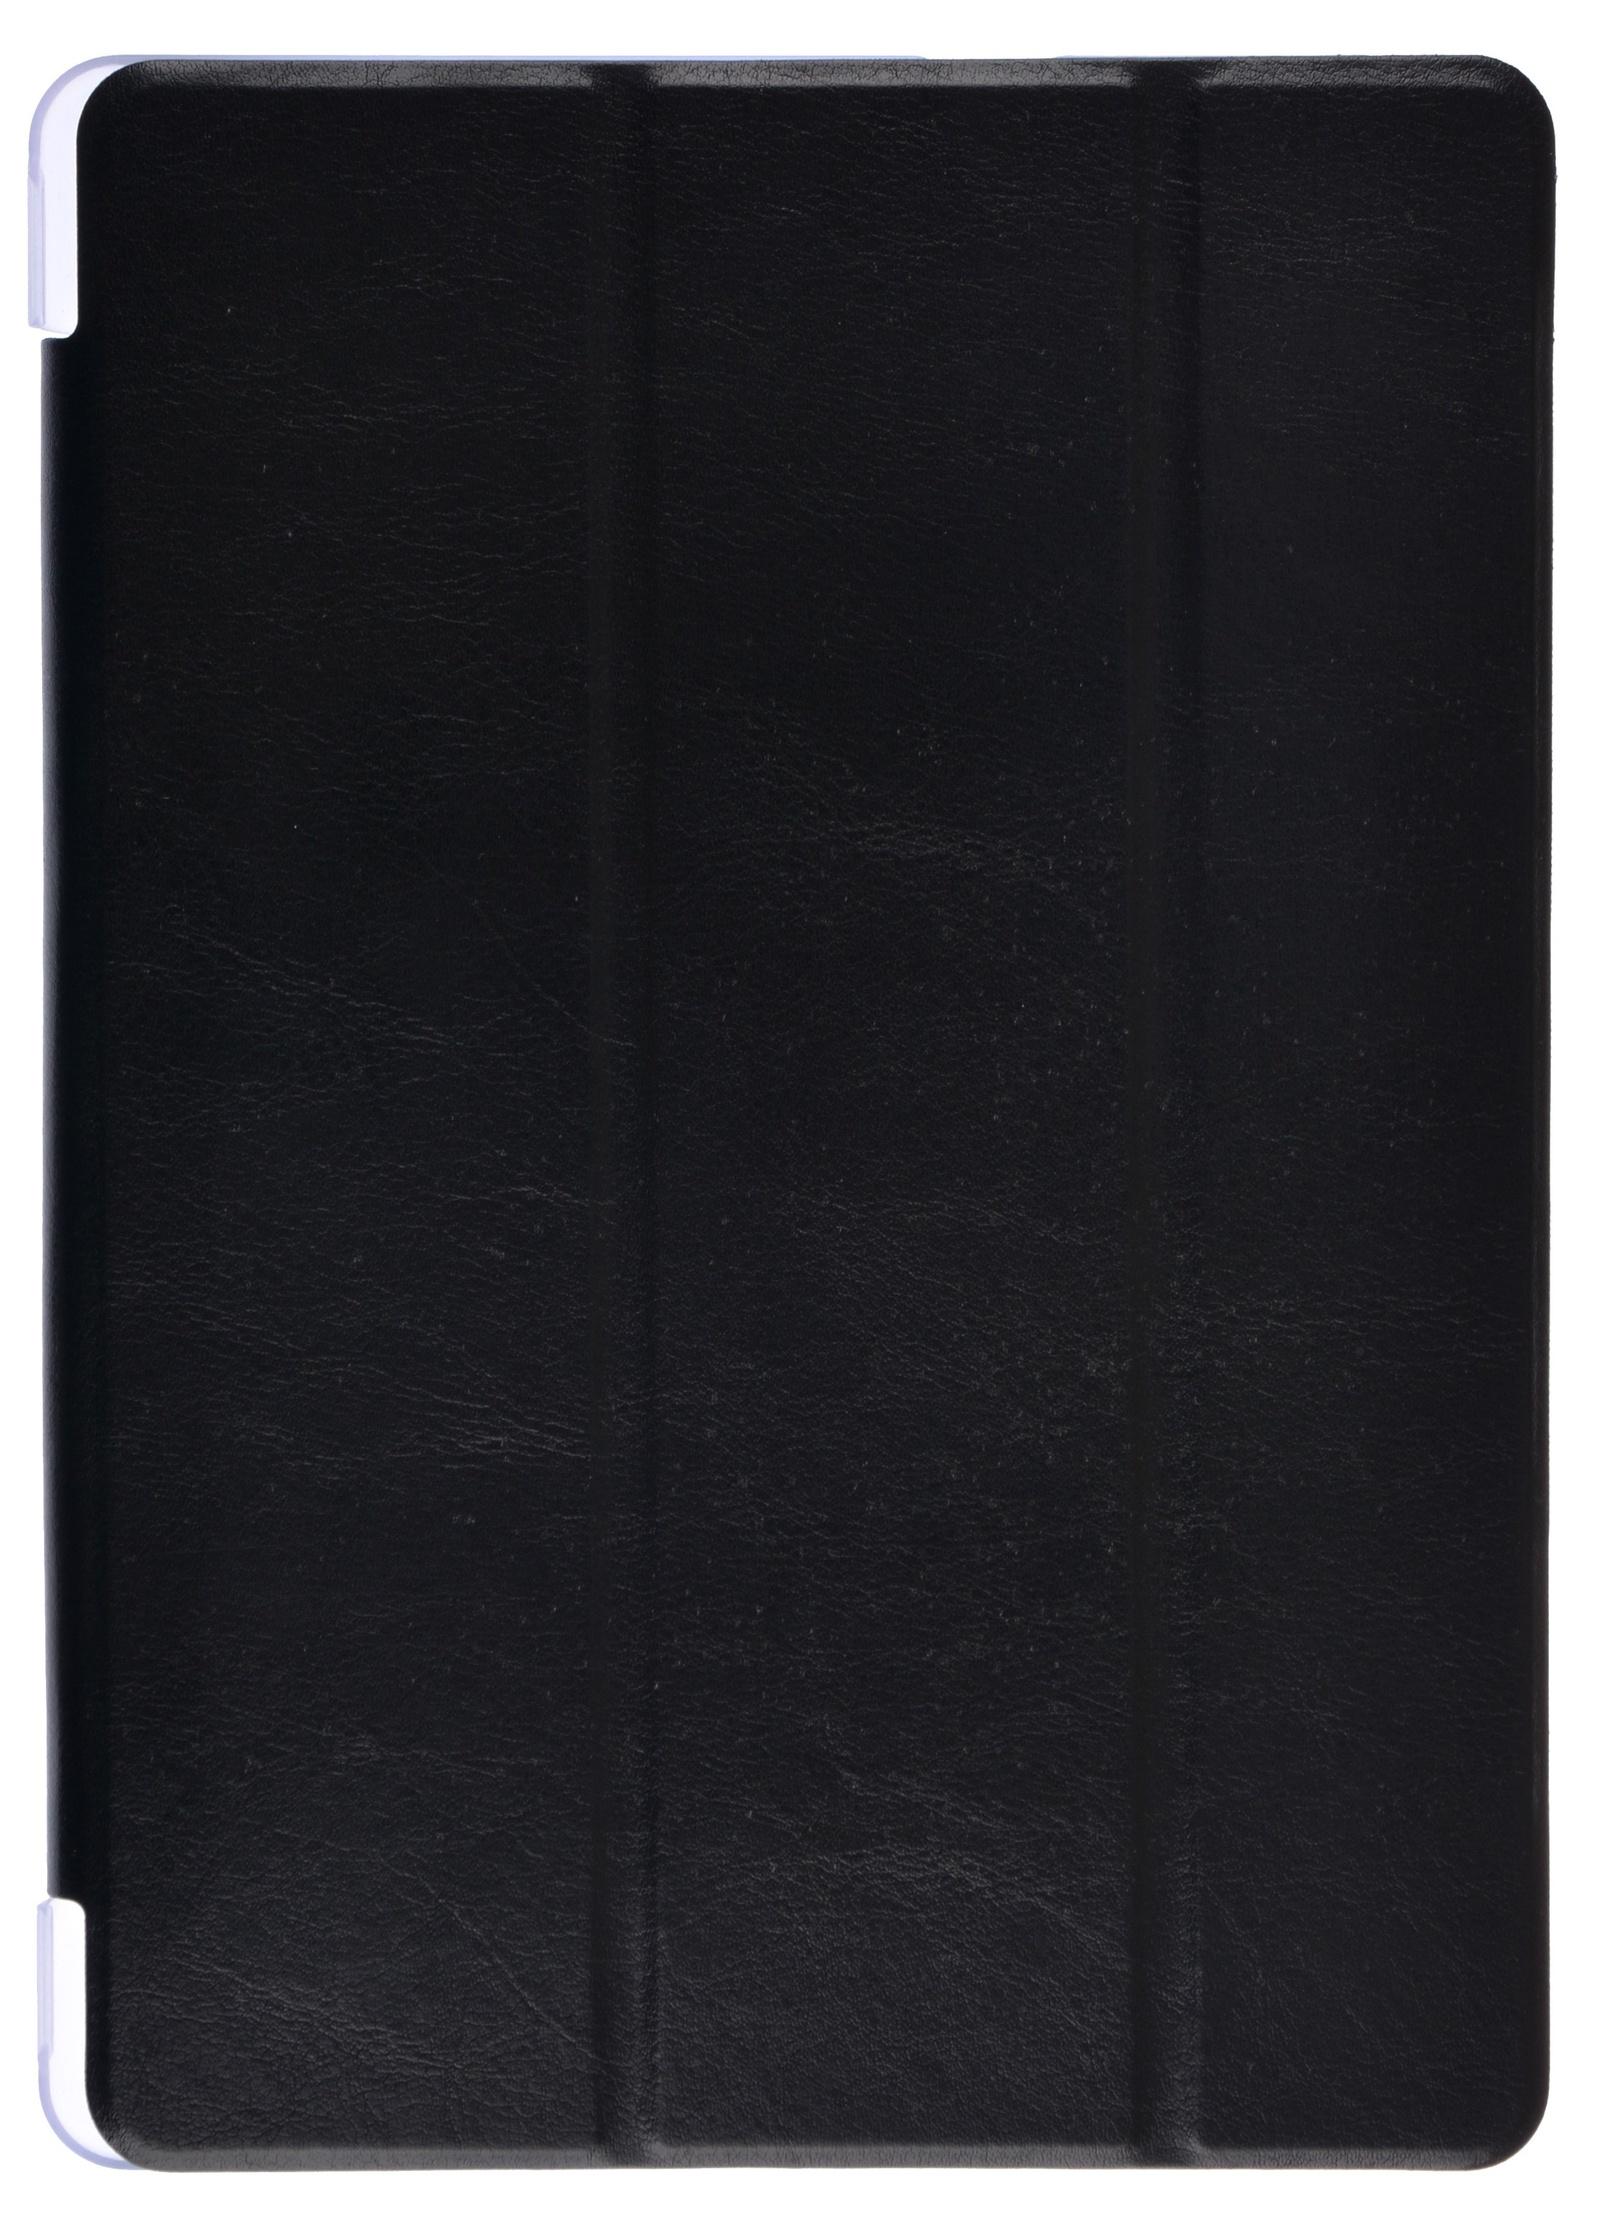 Чехол ProShield Slim Case для Huawei Mediapad T3 10, 4660041404654, черный new slim cover transparent pc back case for huawei mediapad t3 7 3g bg2 u01 tablet case t3 3g 7 0 screen protection stylus